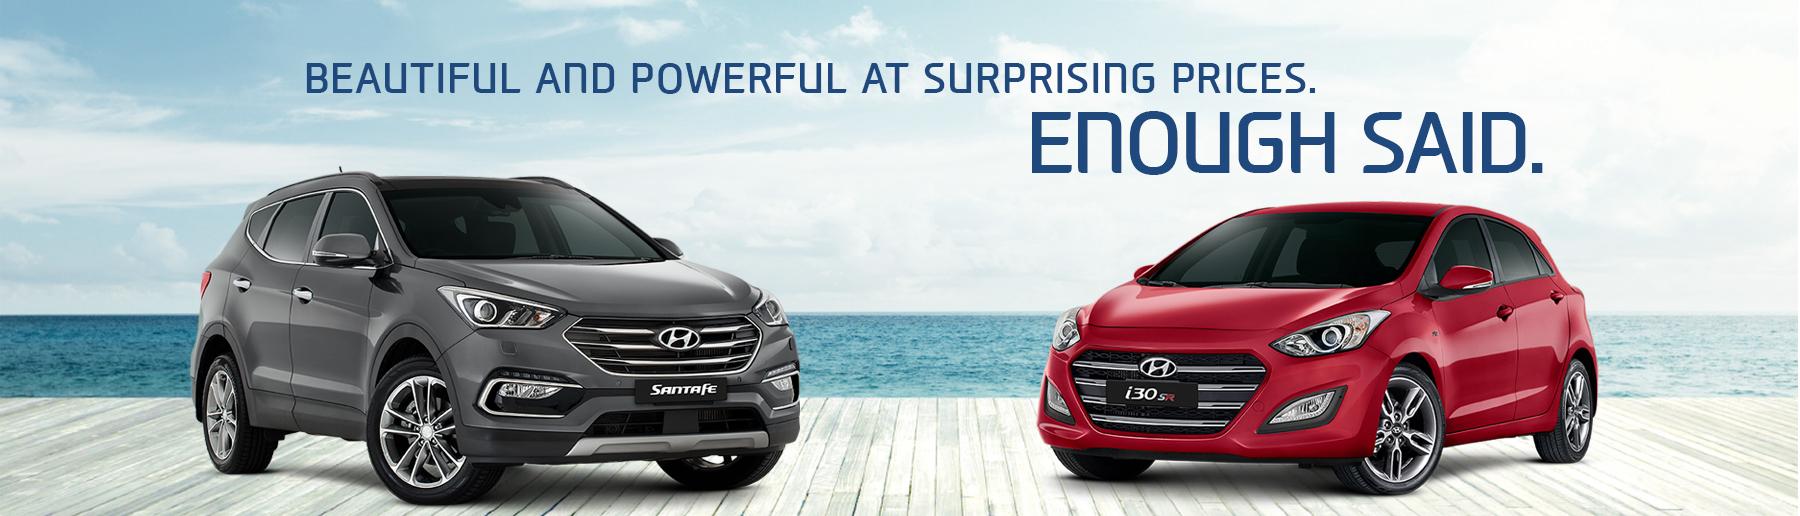 Hyundai Offers